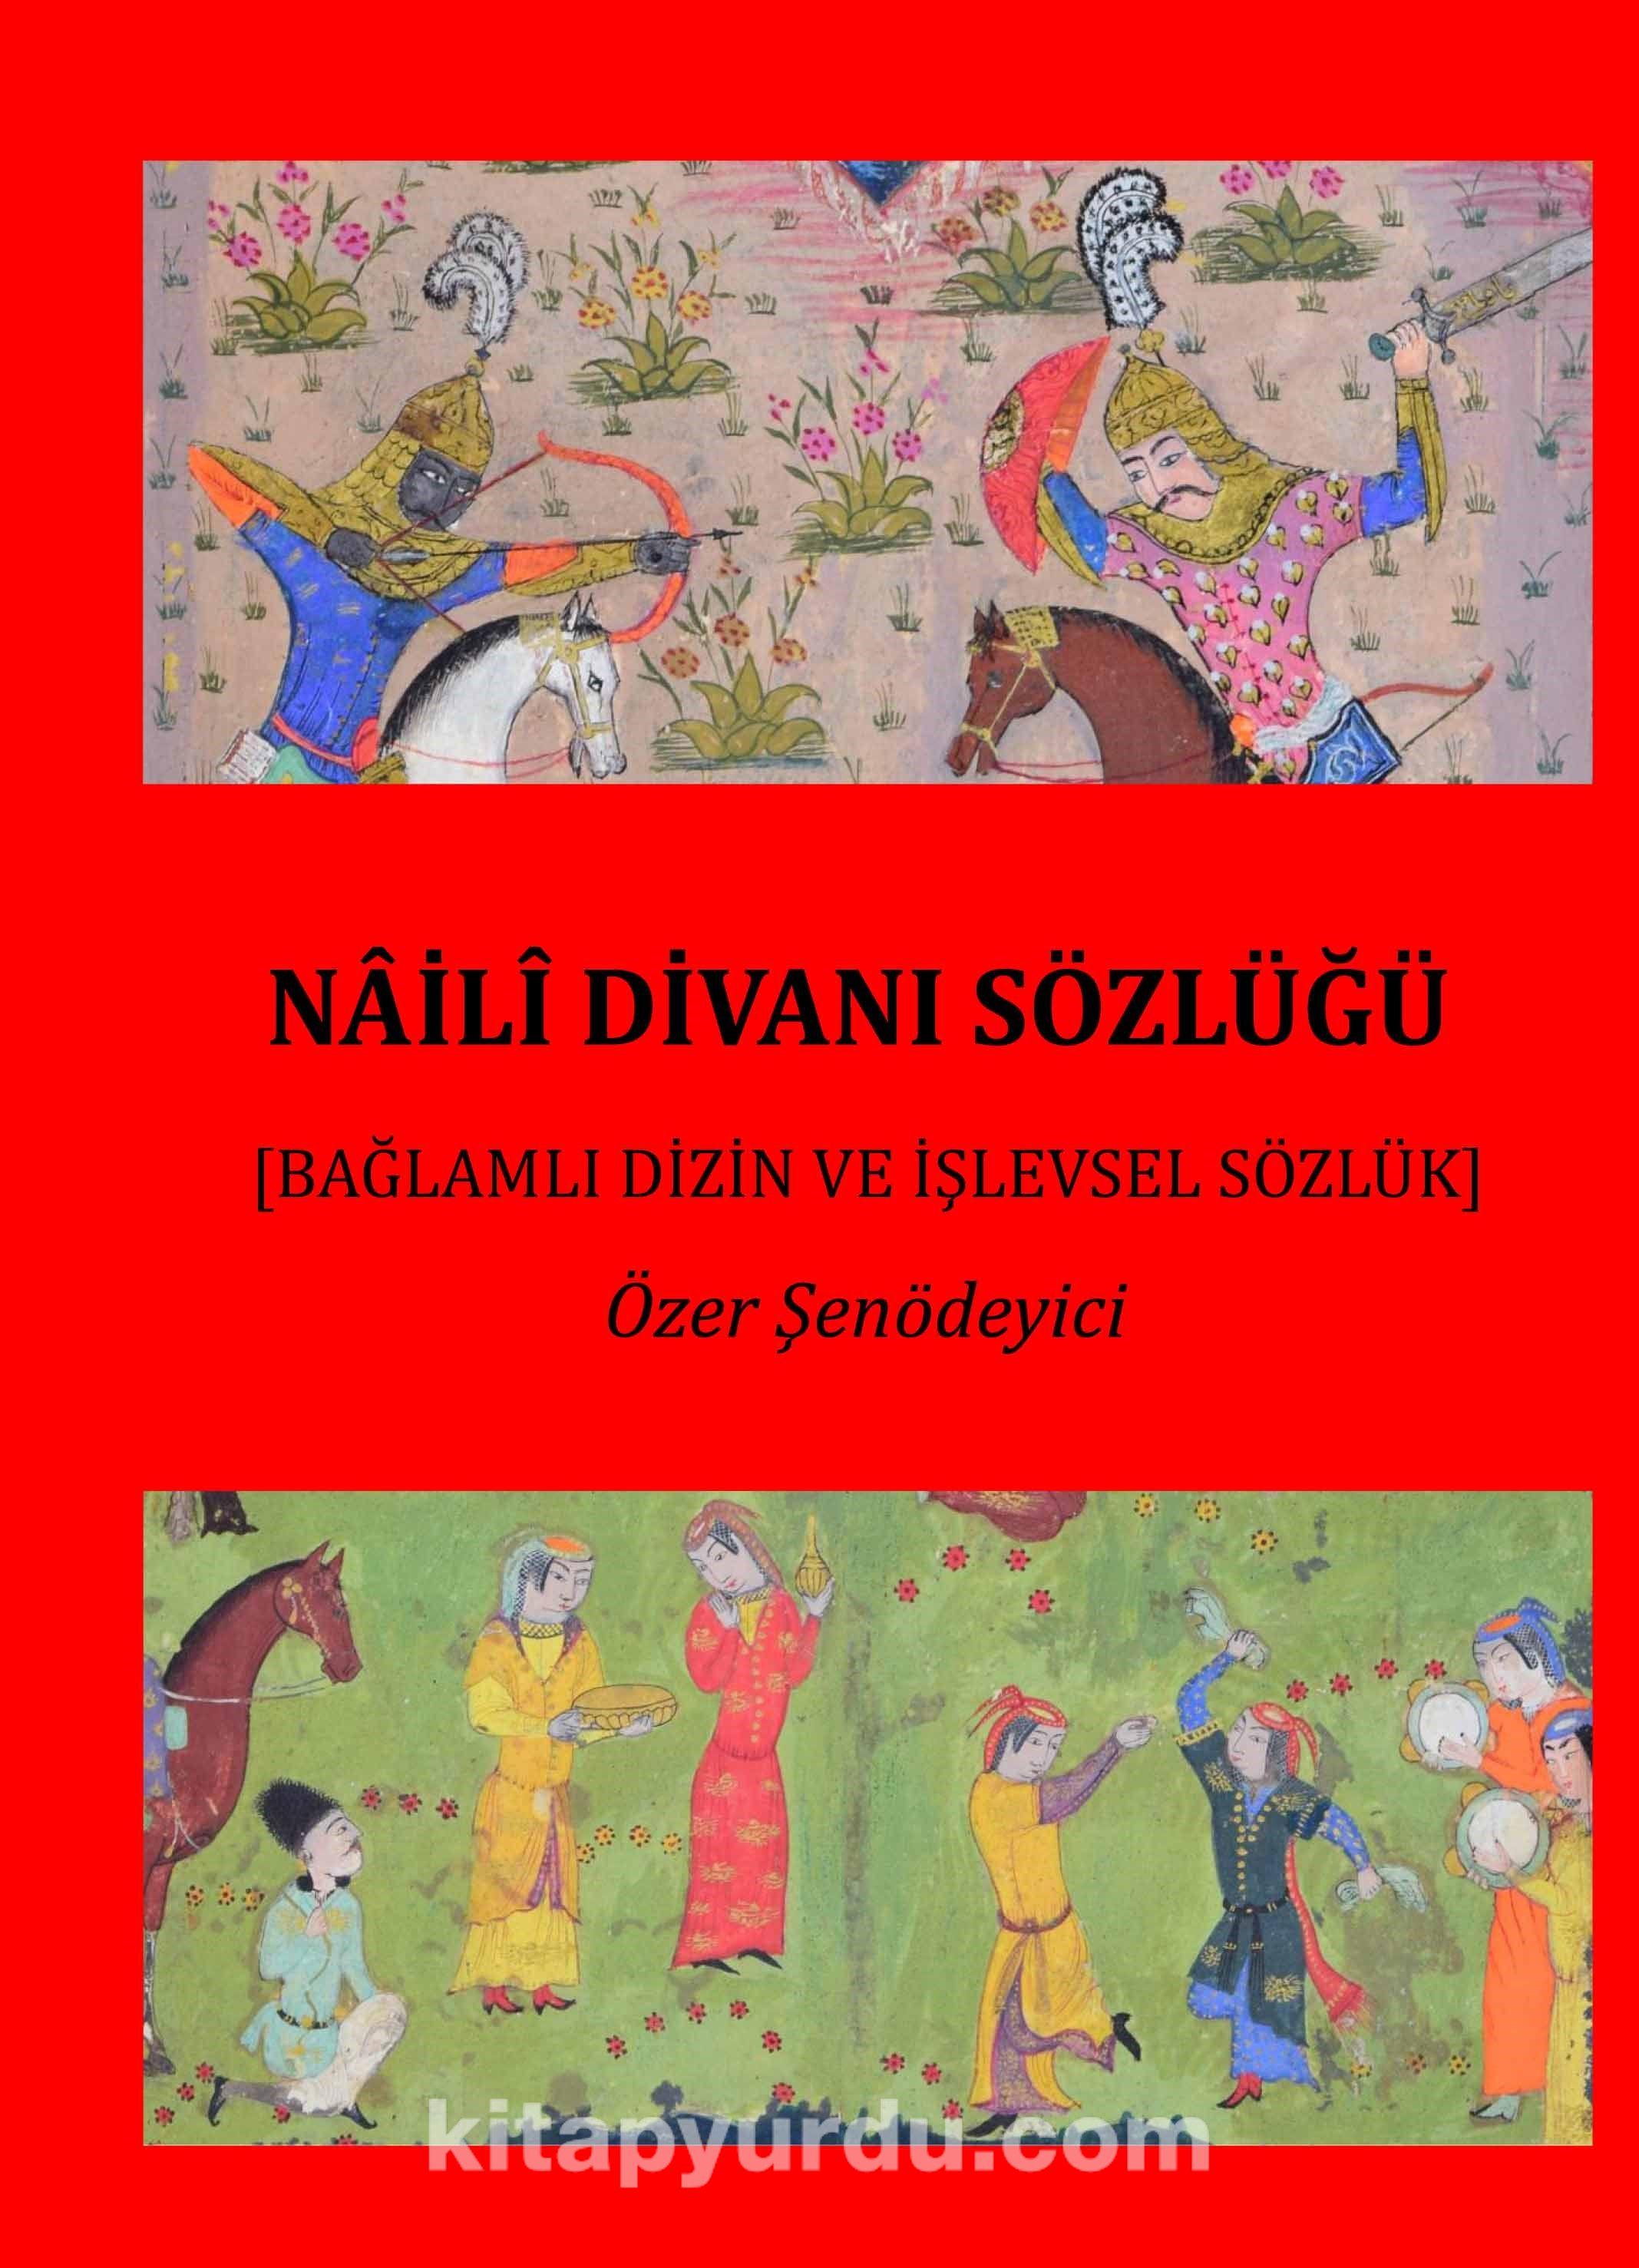 Naili Divanı SözlüğüBağlamlı Dizin ve İşlevsel Sözlük (2 CİLT) - Prof. Dr. Özer Şenödeyici pdf epub